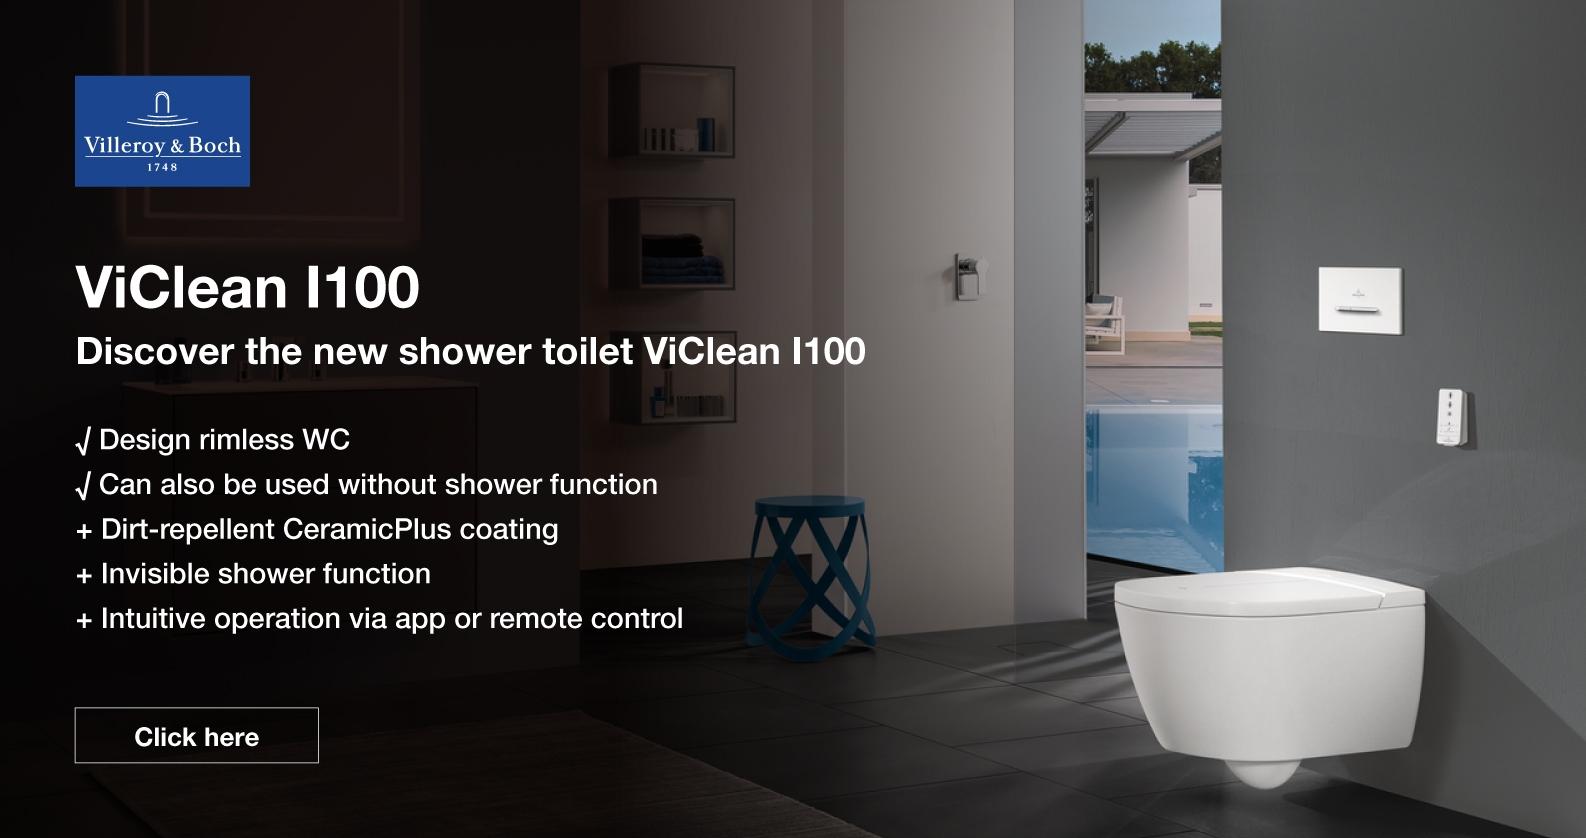 Villeroy & Boch ViClean I100